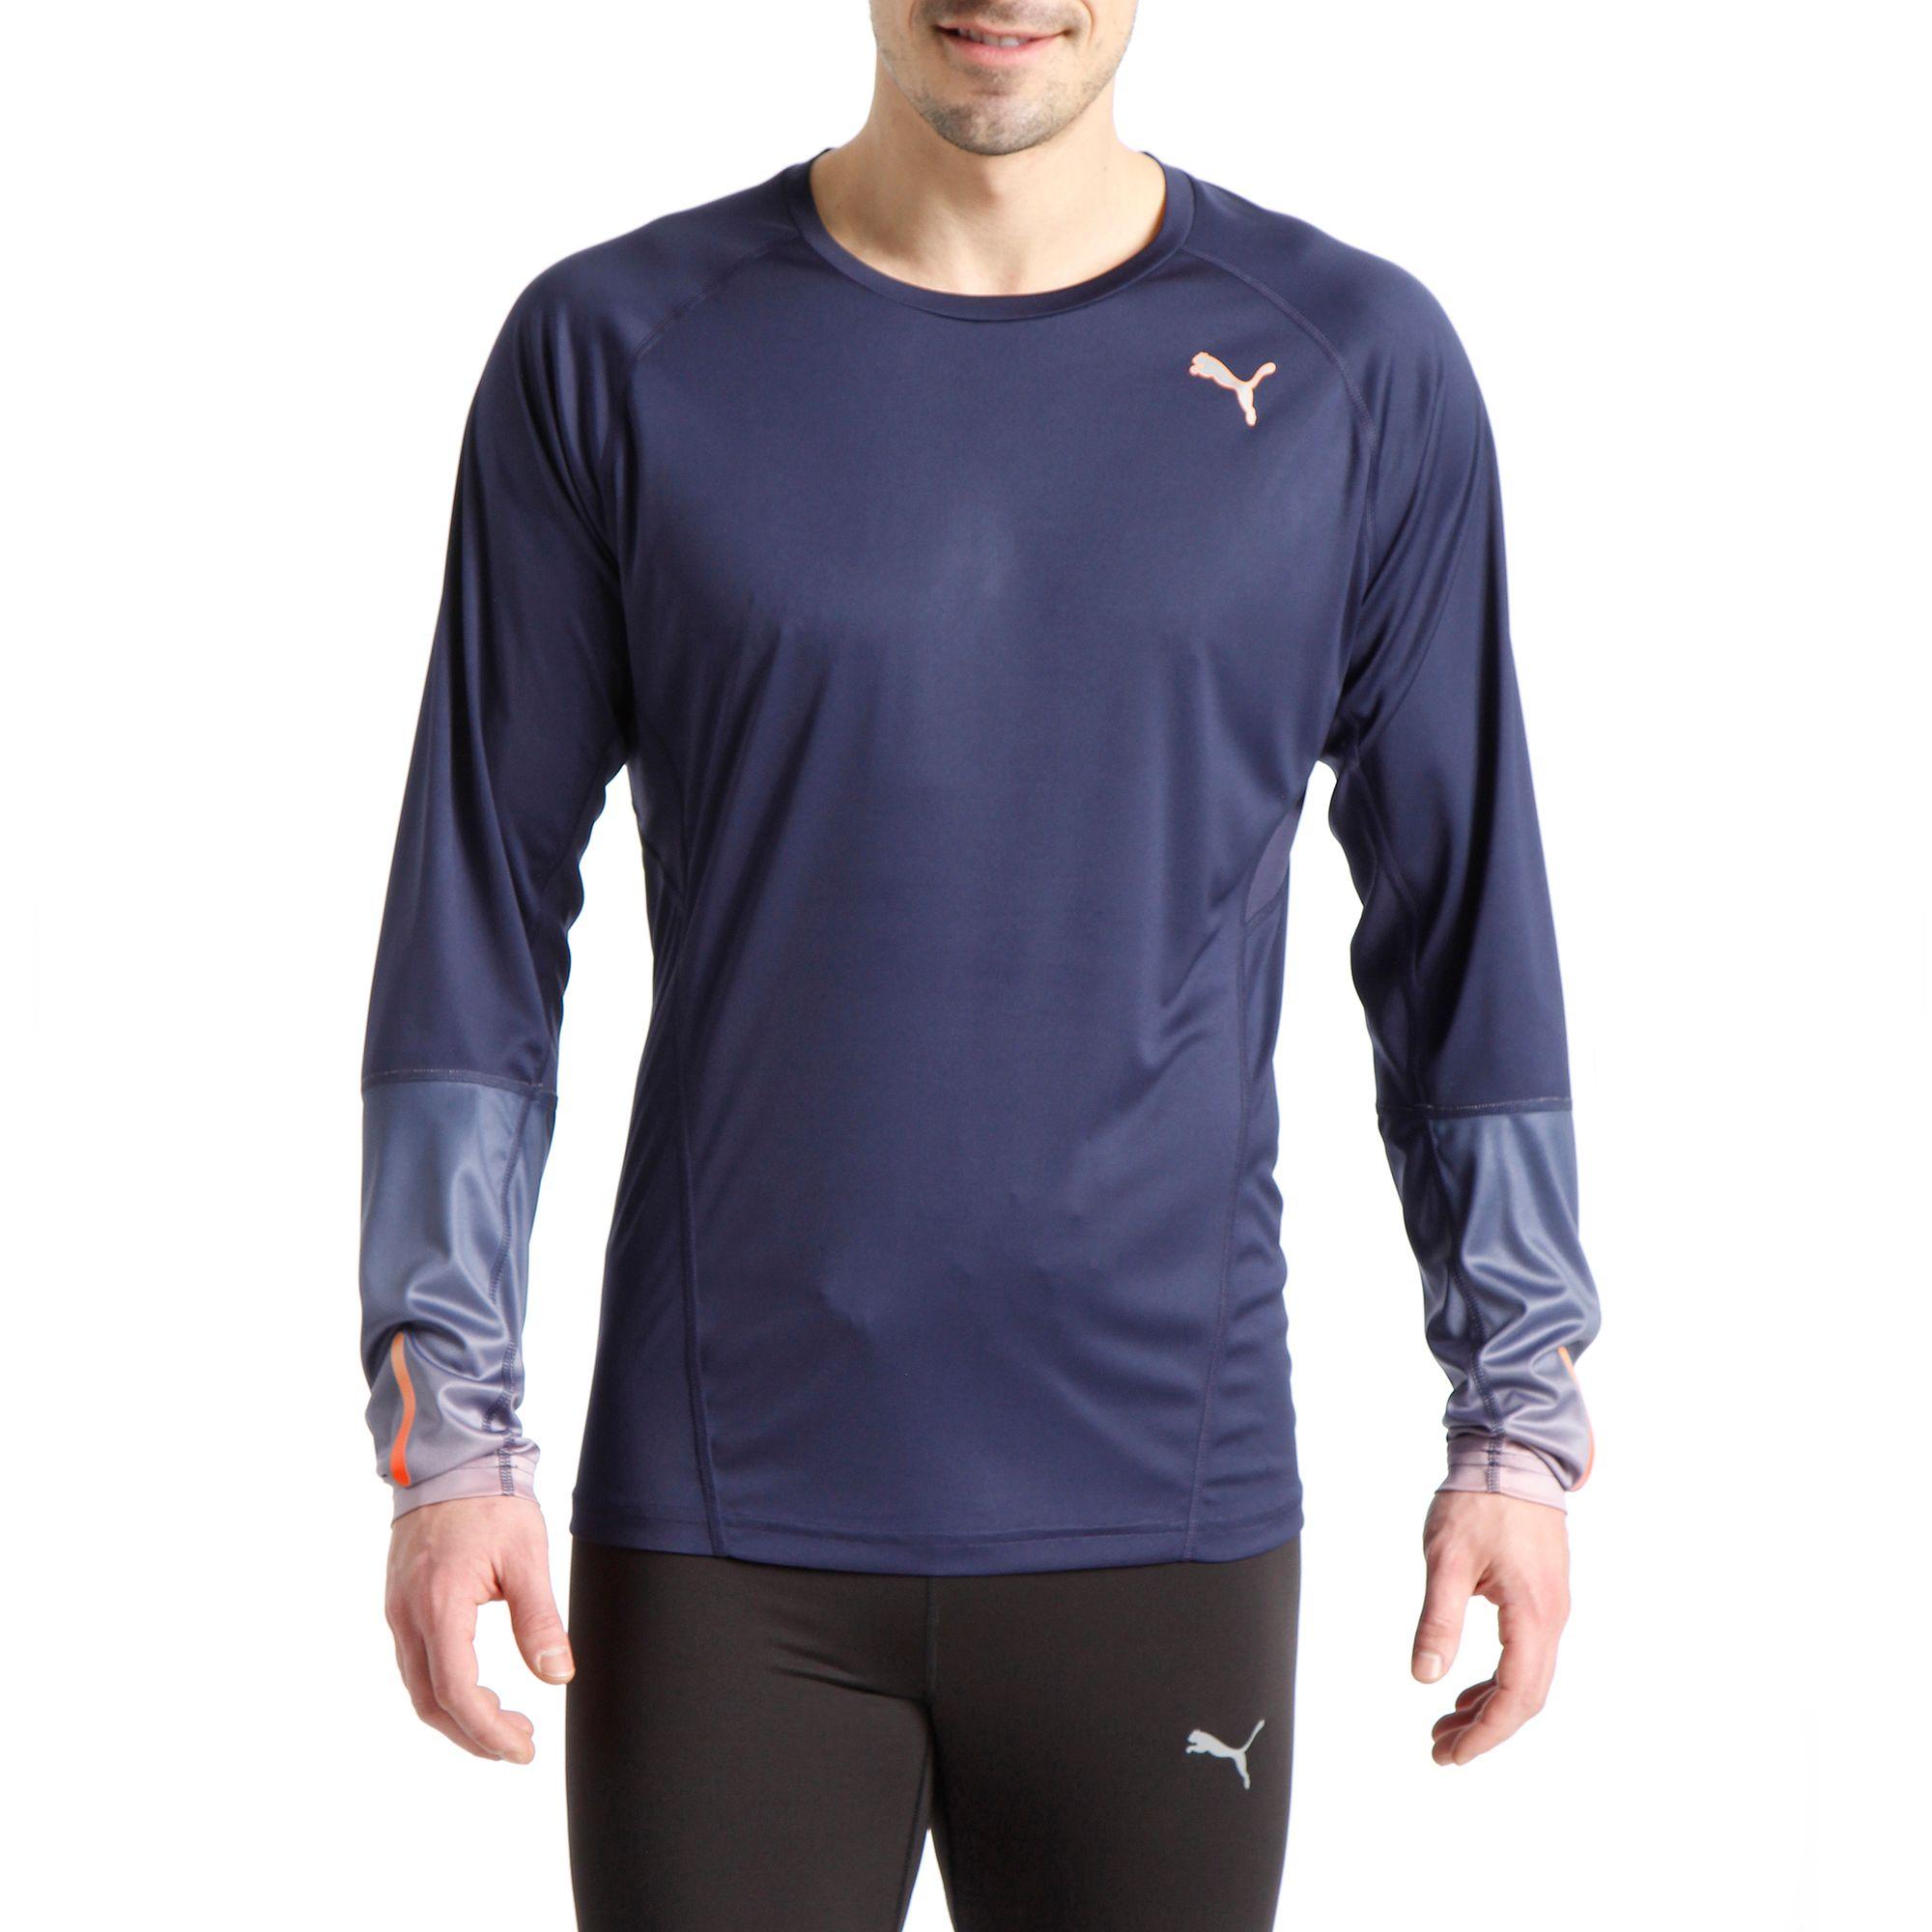 puma running ignite langarm shirt t shirt running laufen herren ebay. Black Bedroom Furniture Sets. Home Design Ideas